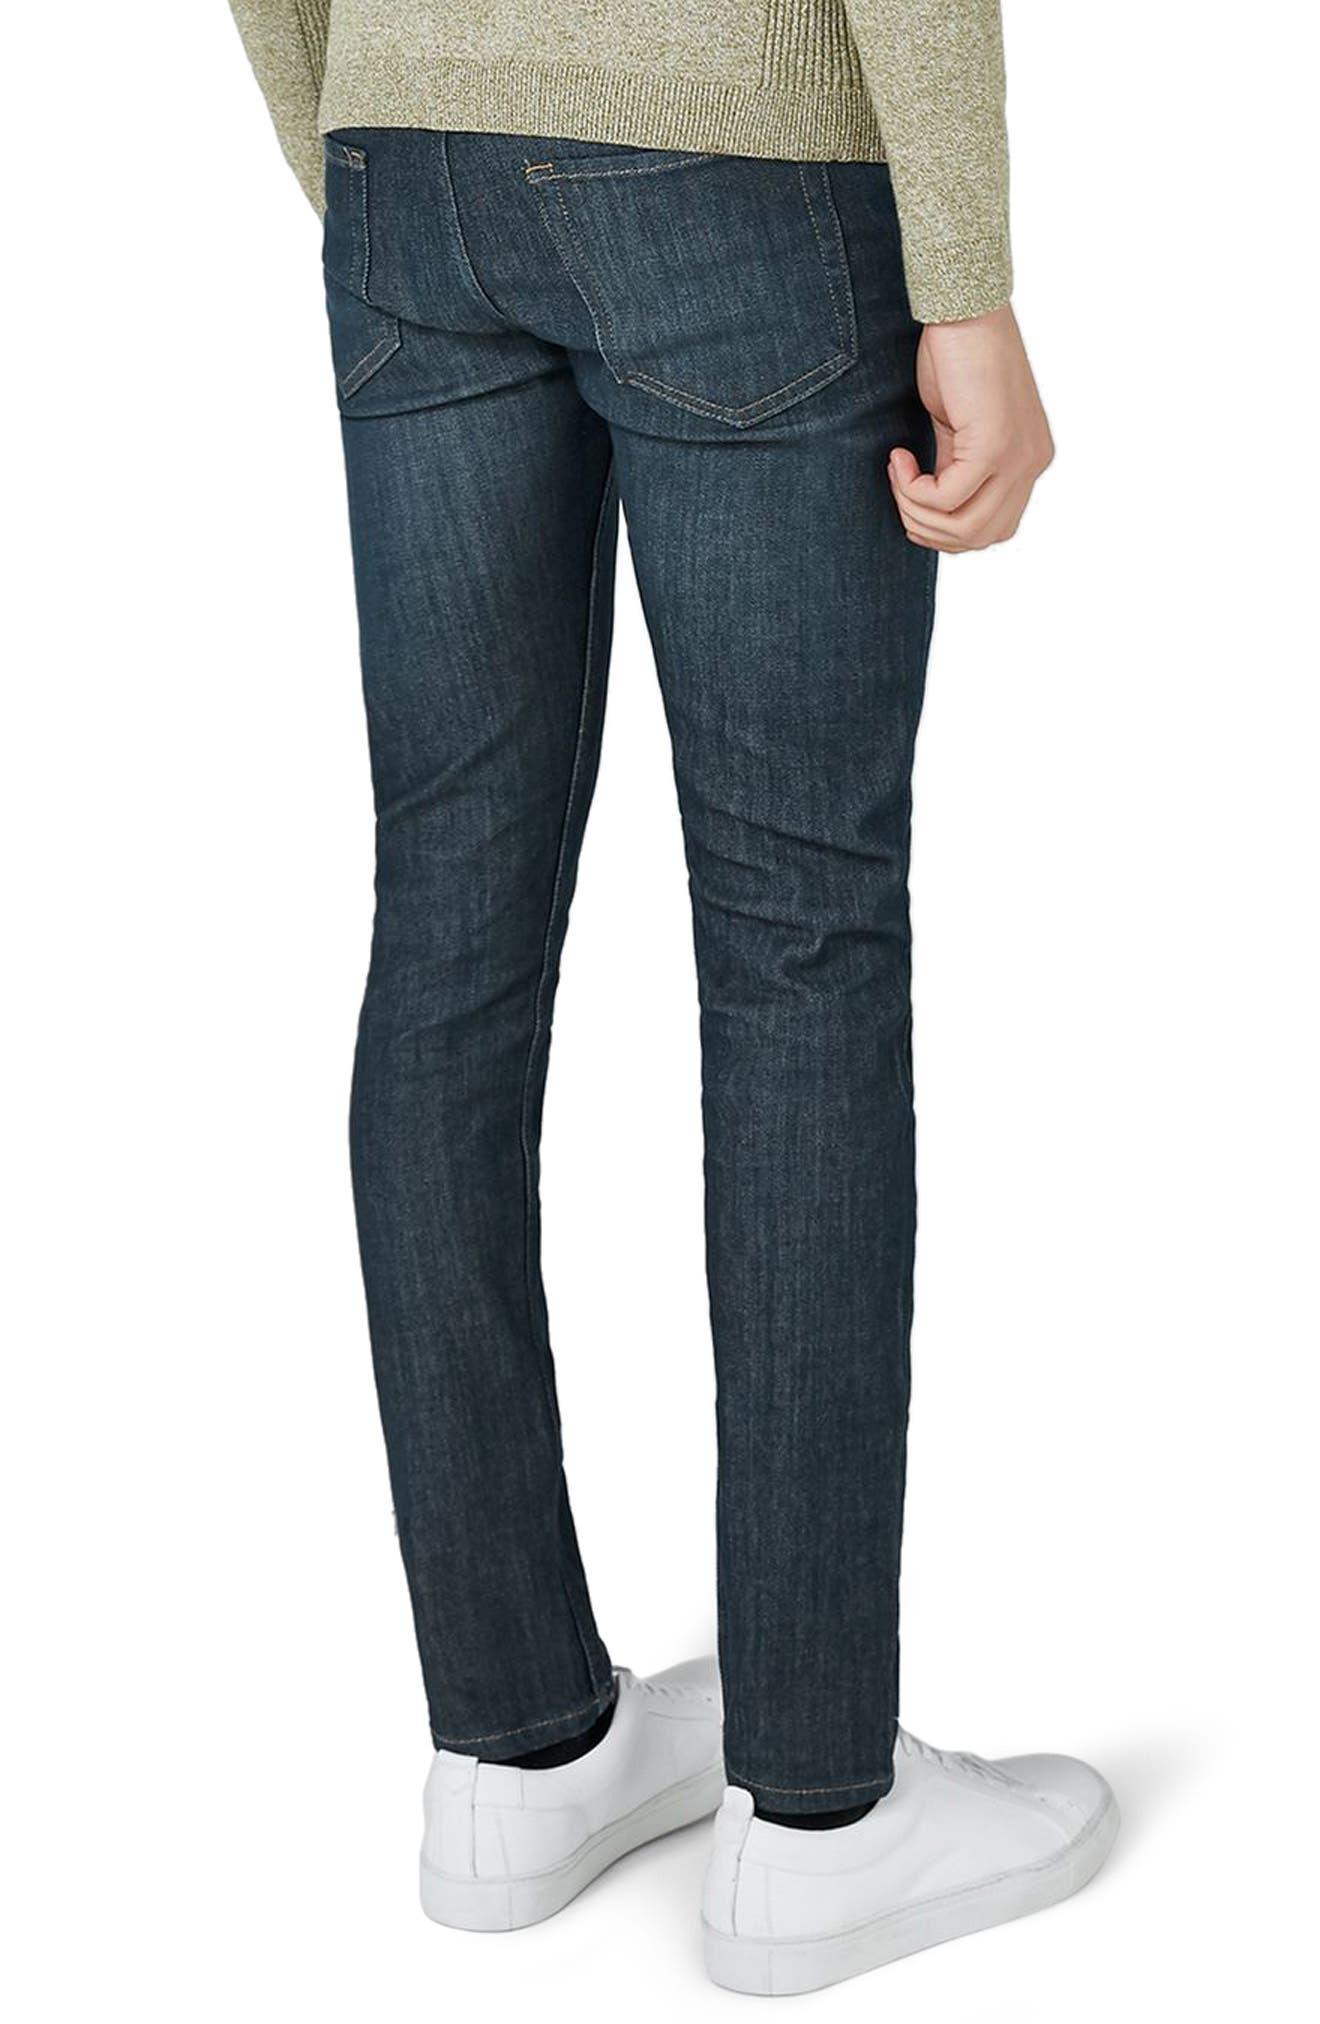 Coated Denim Skinny Jeans,                             Alternate thumbnail 2, color,                             BLUE